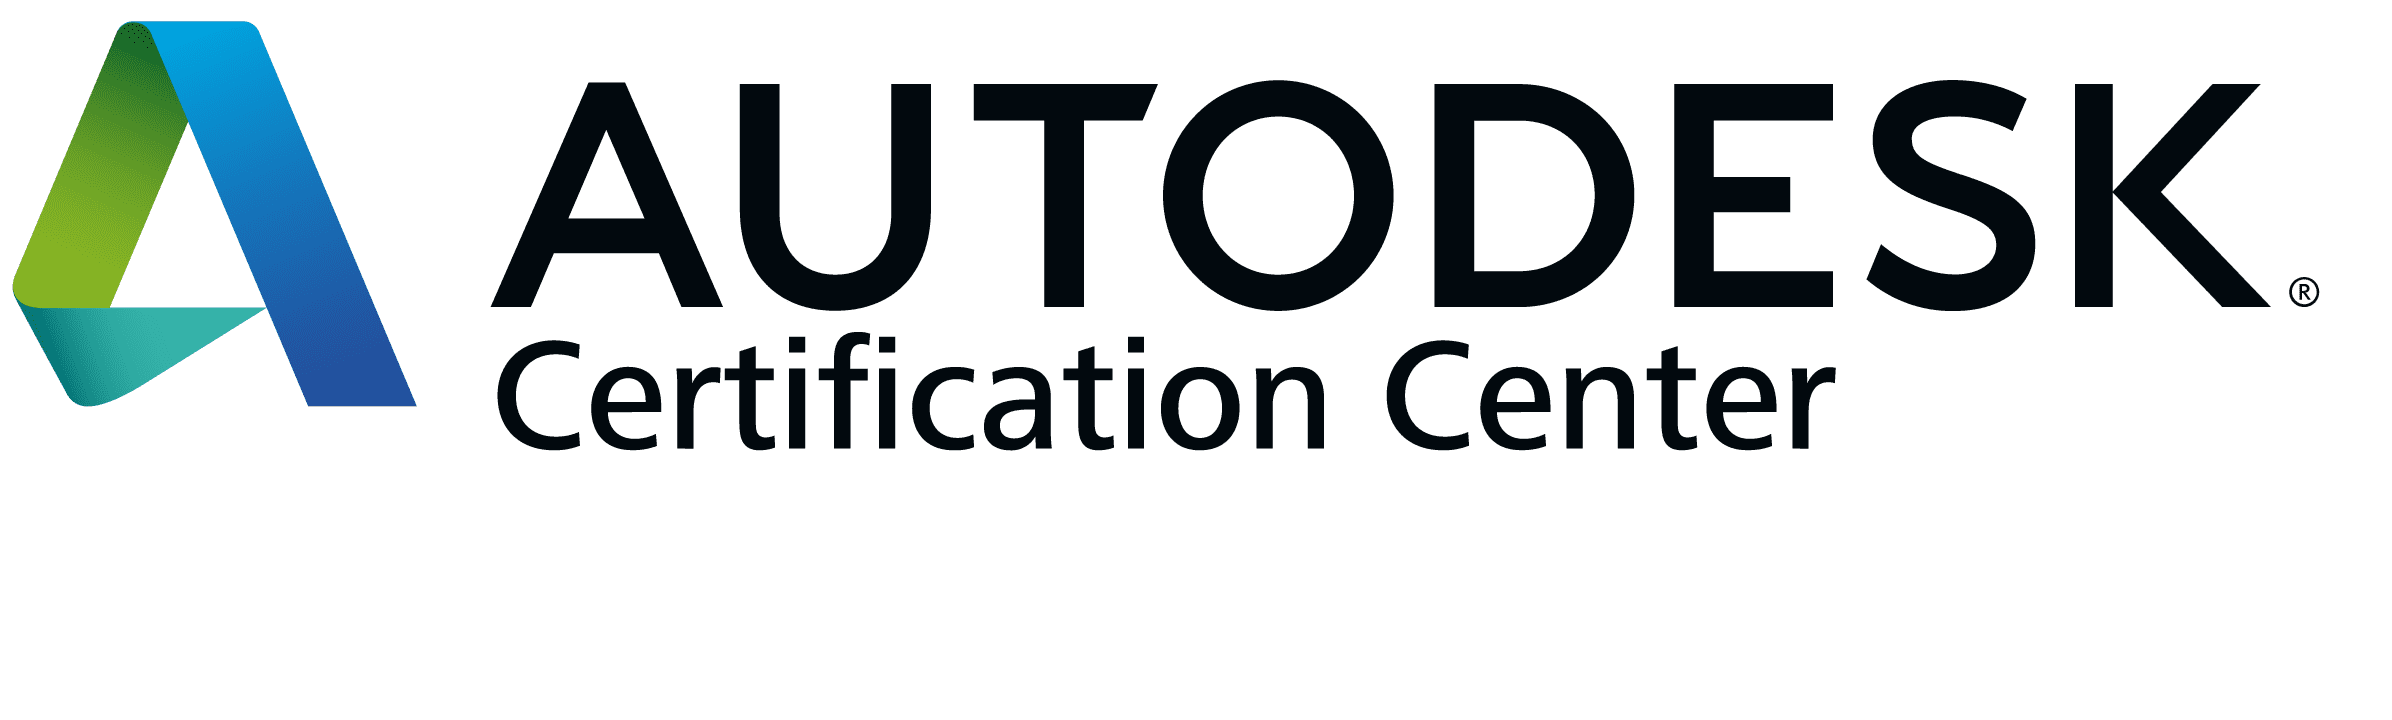 autodesk-certification-centre (1)